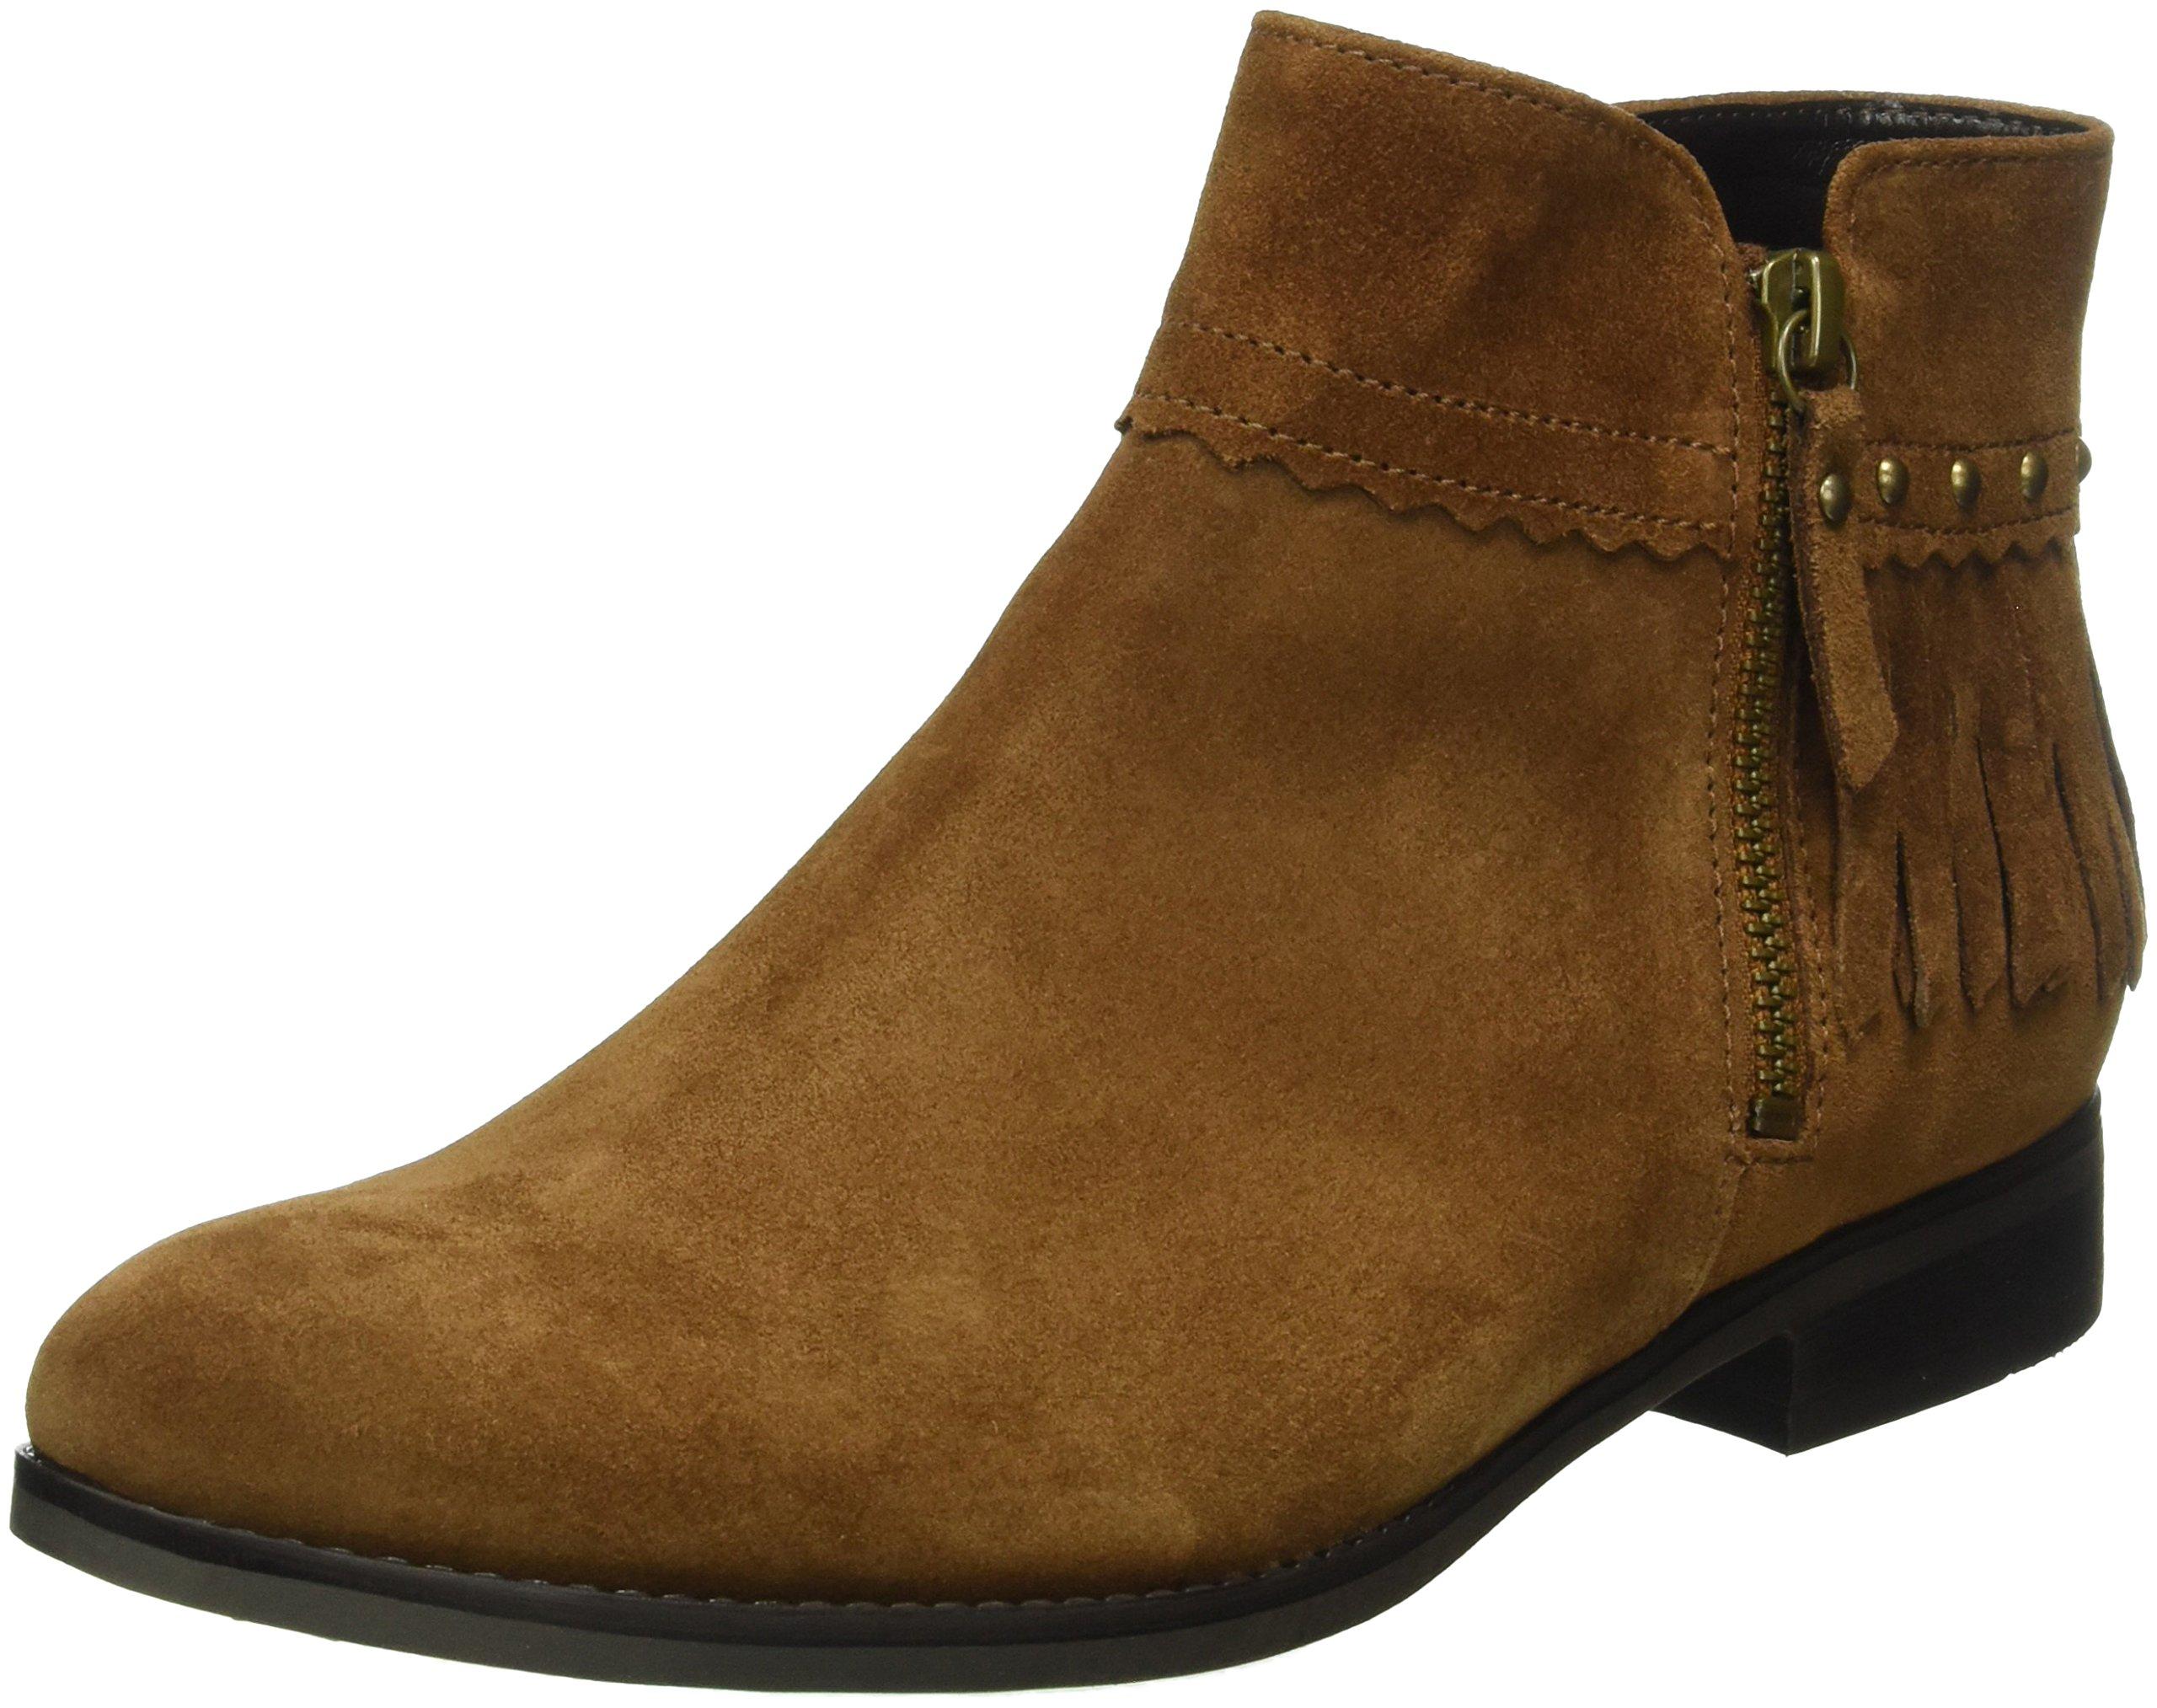 Santiags Shoes Eu Gabor 663 FemmeMarron41 51 J13FTcKul